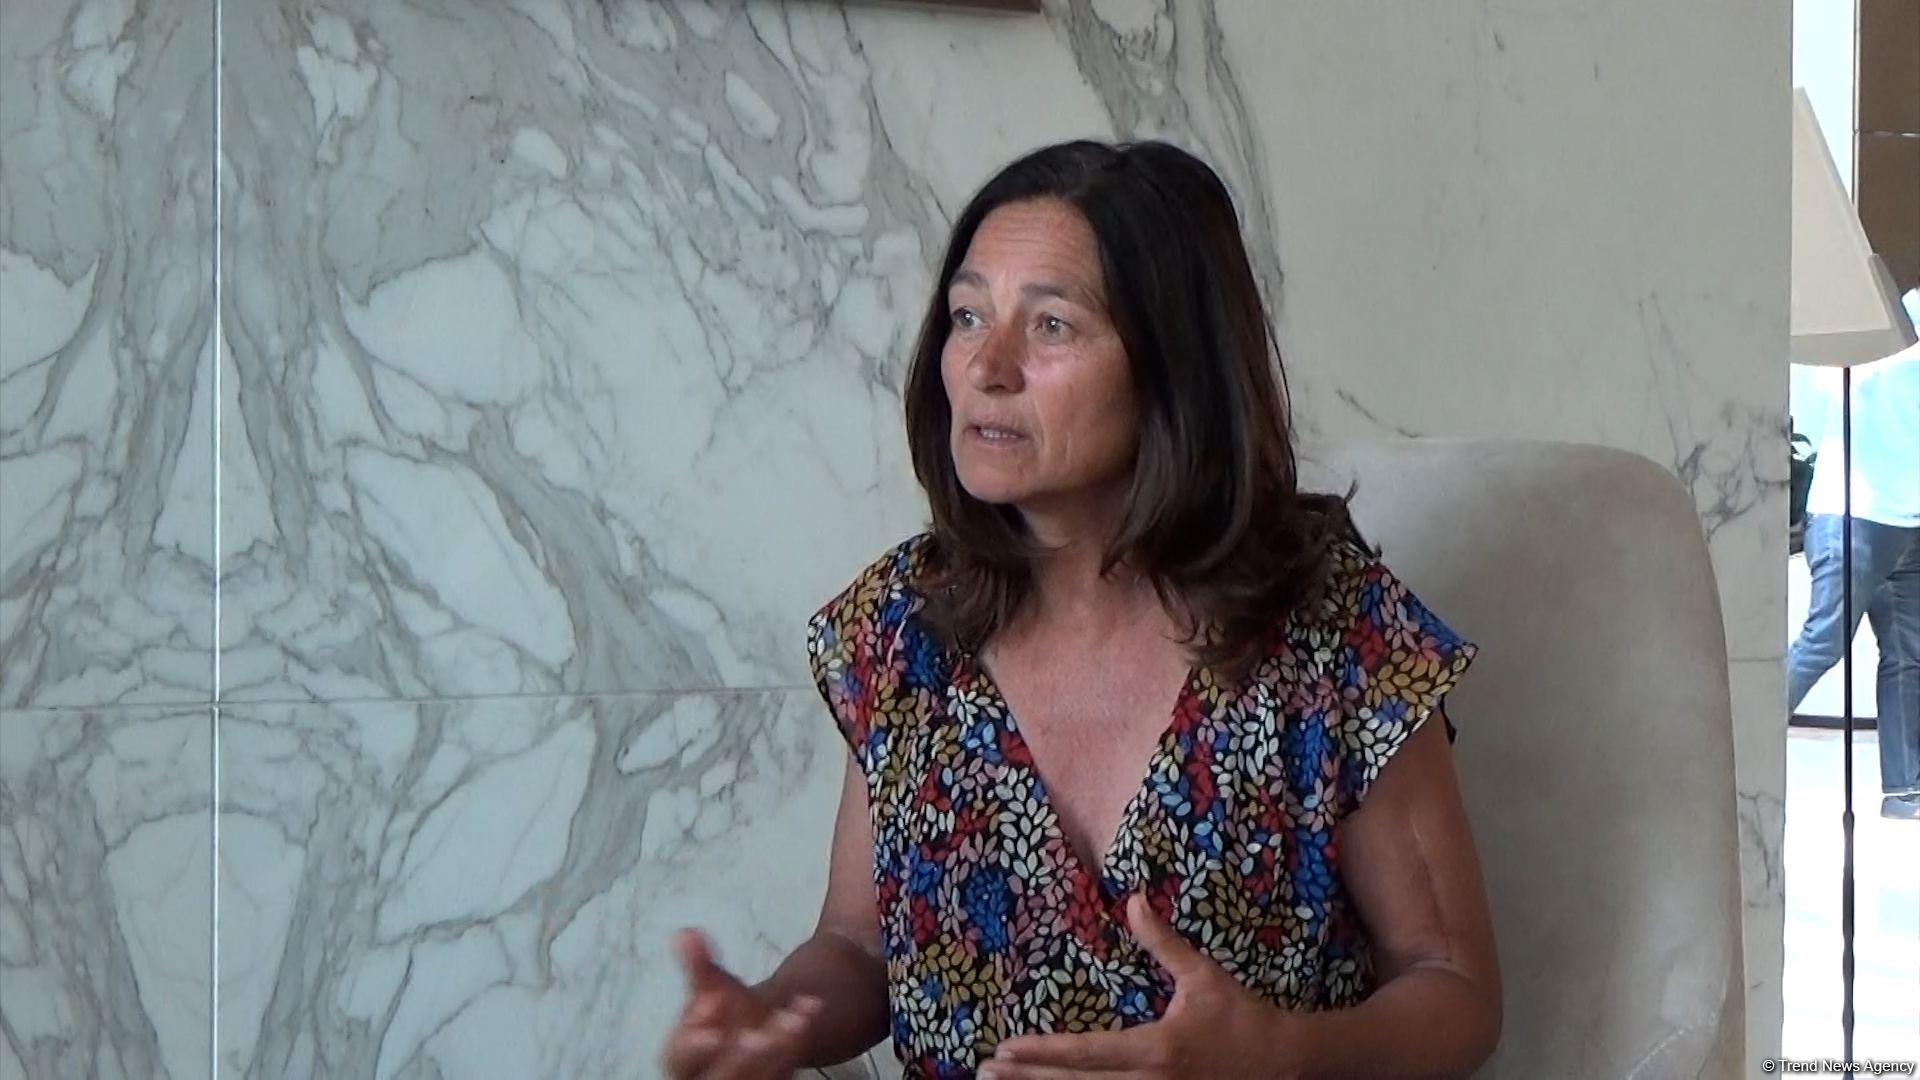 Sandrine Mörch: Settlements in Azerbaijan's liberated lands razed to the ground